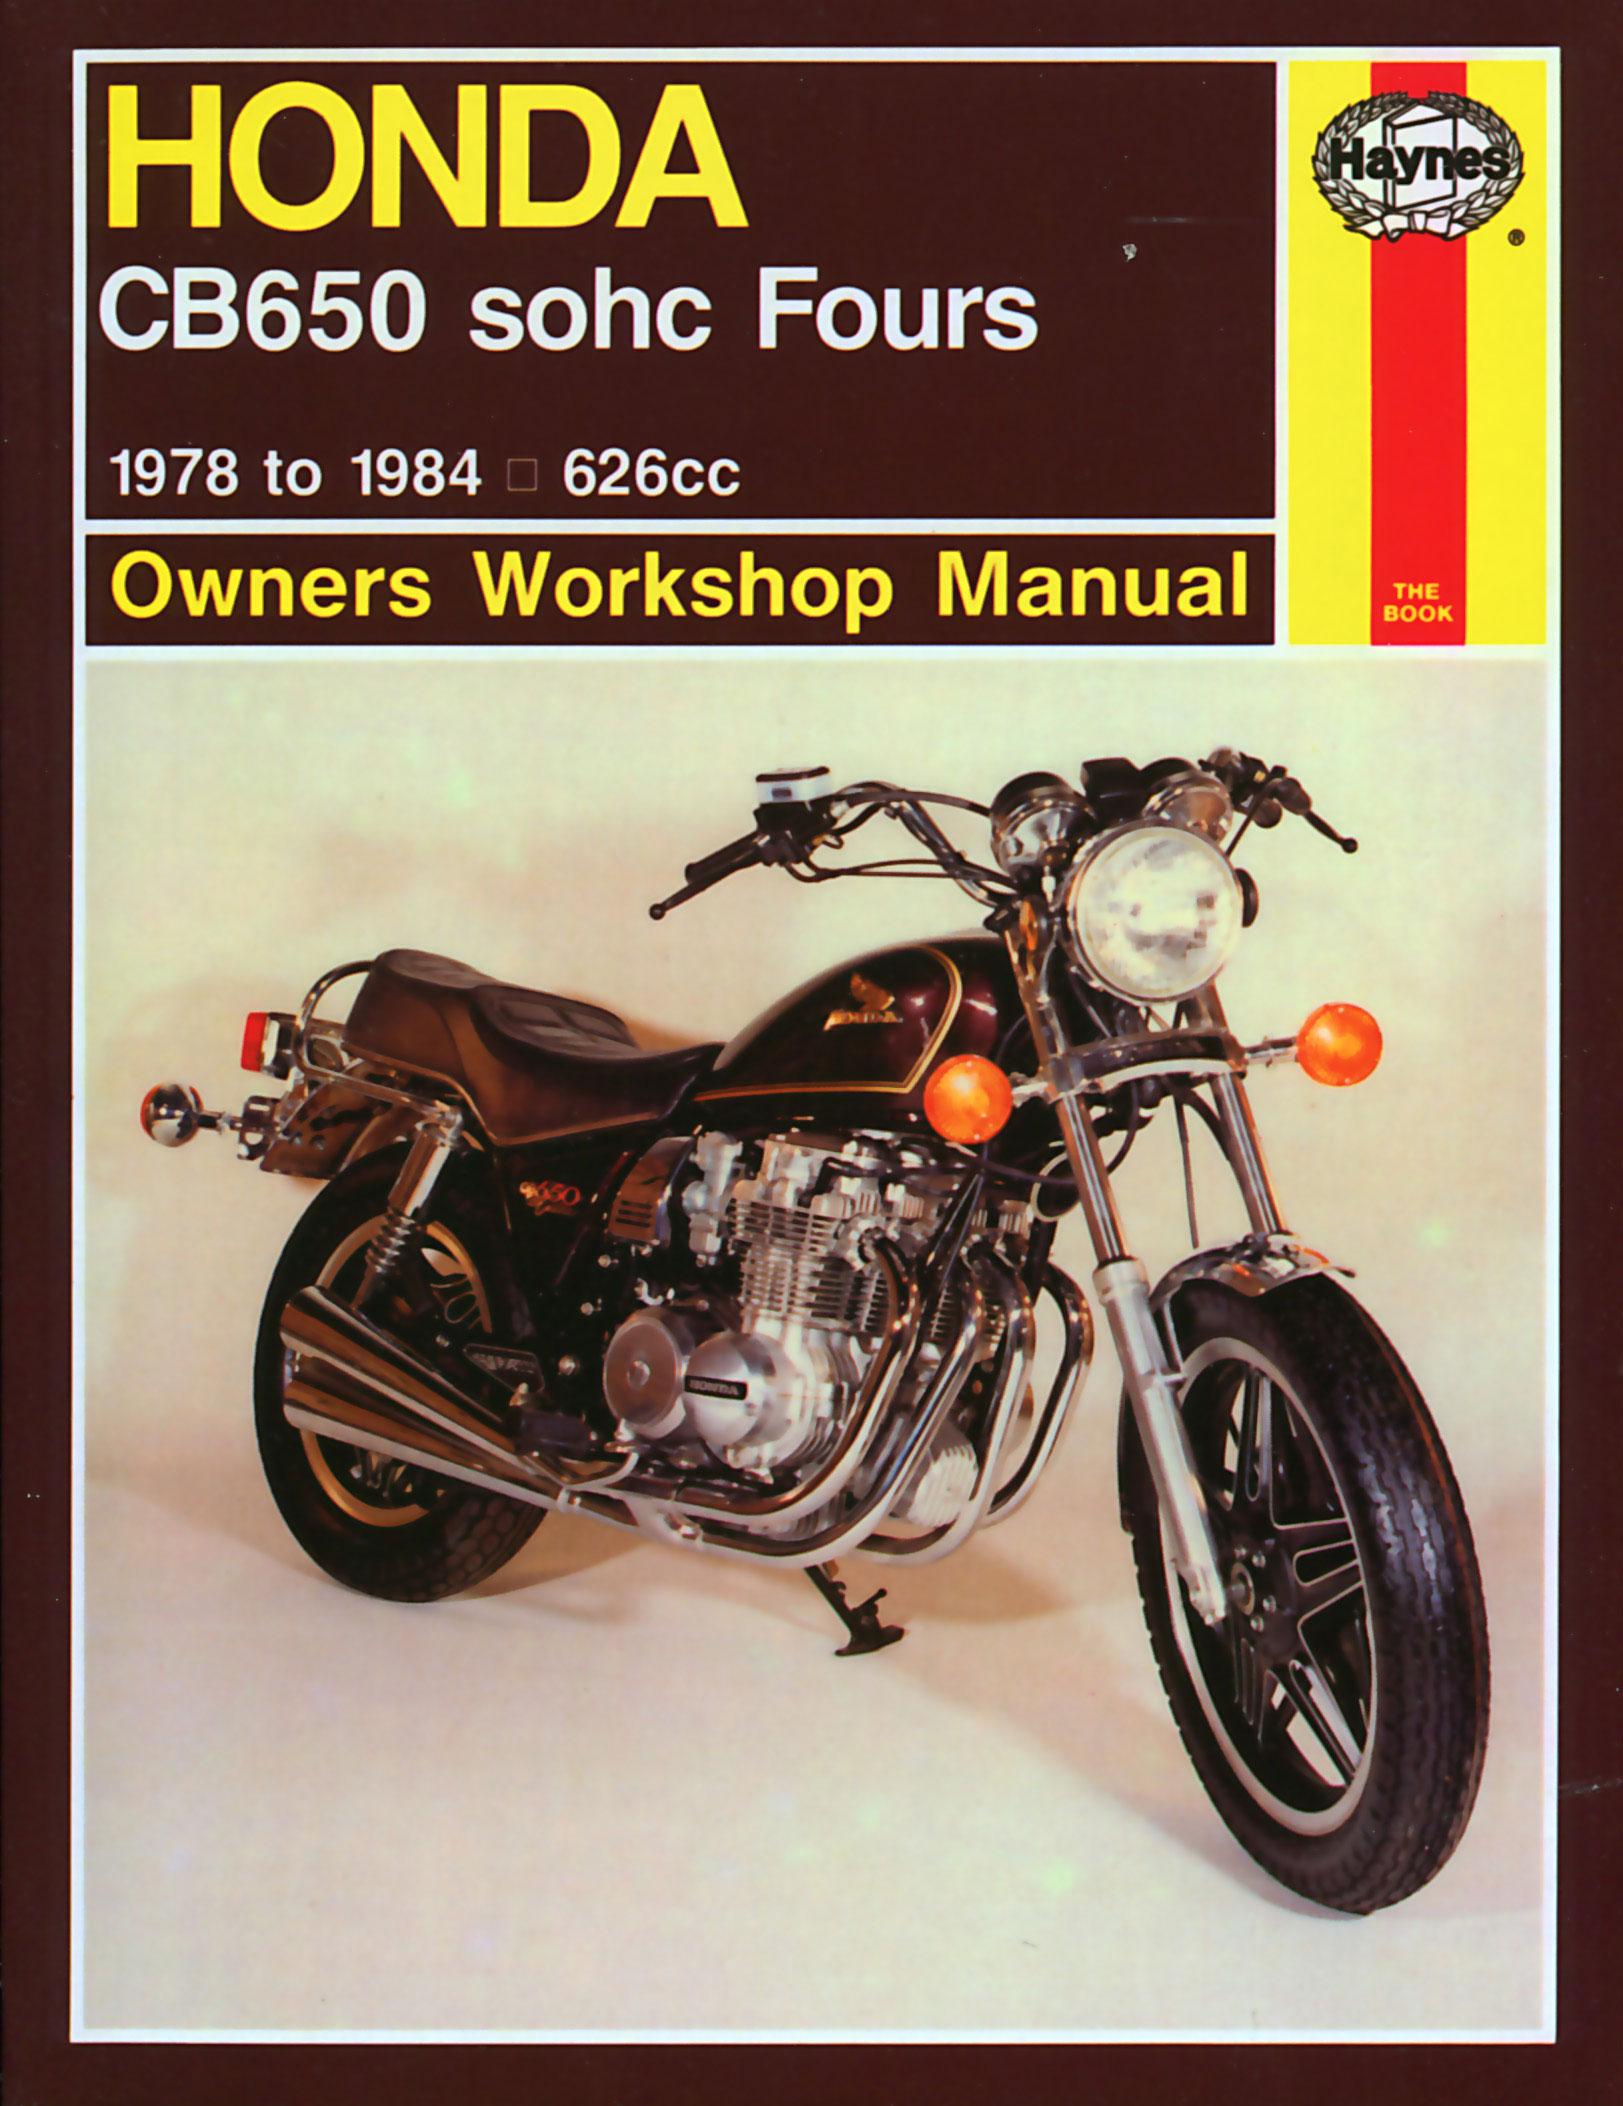 haynes repair manual honda cb650 sohc fours 1979 1982 rh motorcycleworks com 1980 Honda CB650 Custom 1980 Honda CB650 Cafe Racer